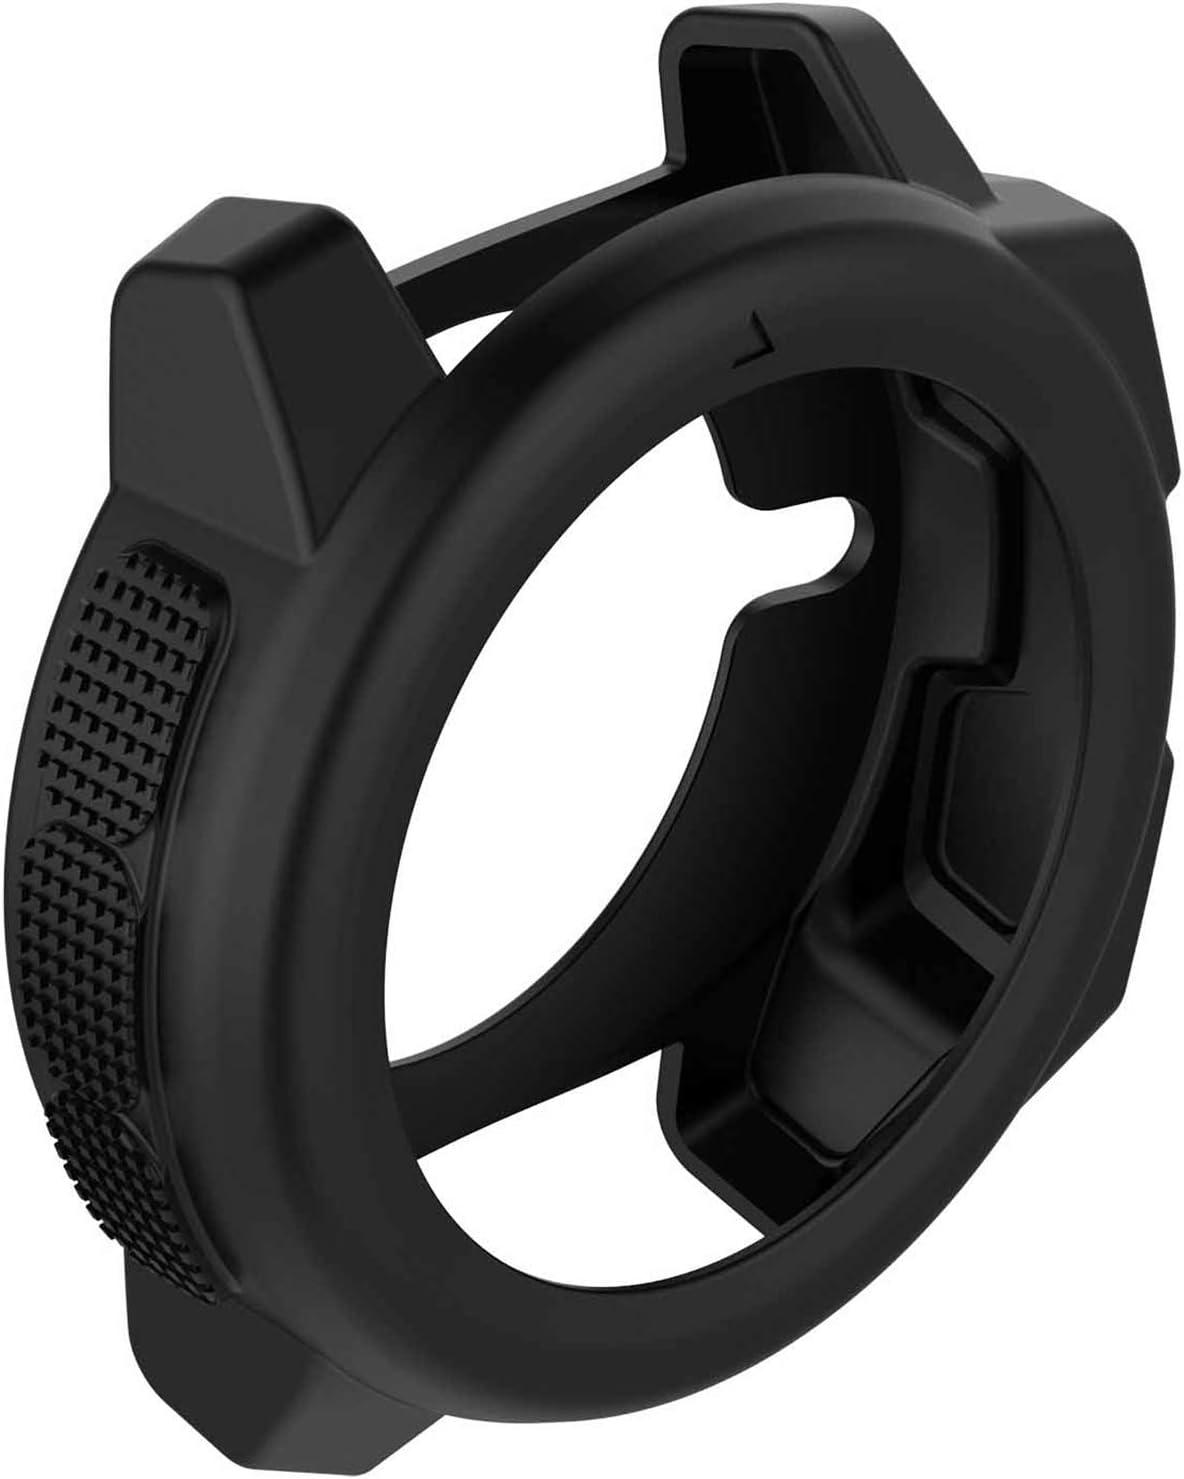 Lichifit Weiche Silikon Schutzhülle Hülle Schutzhülle Elektronik